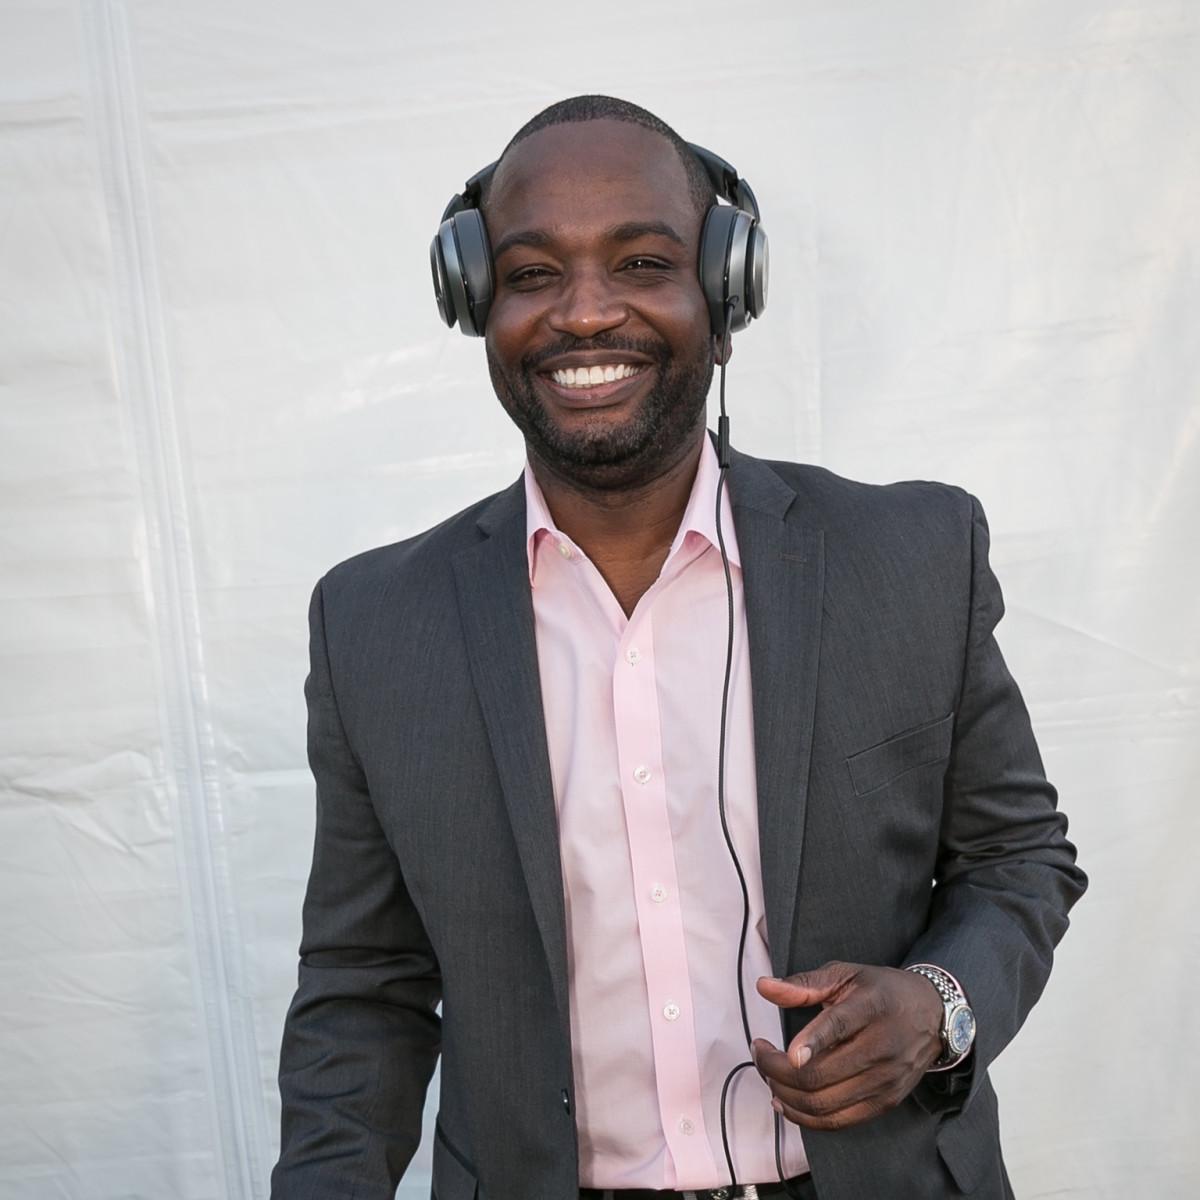 Valobra grand opening party DJ Seneca